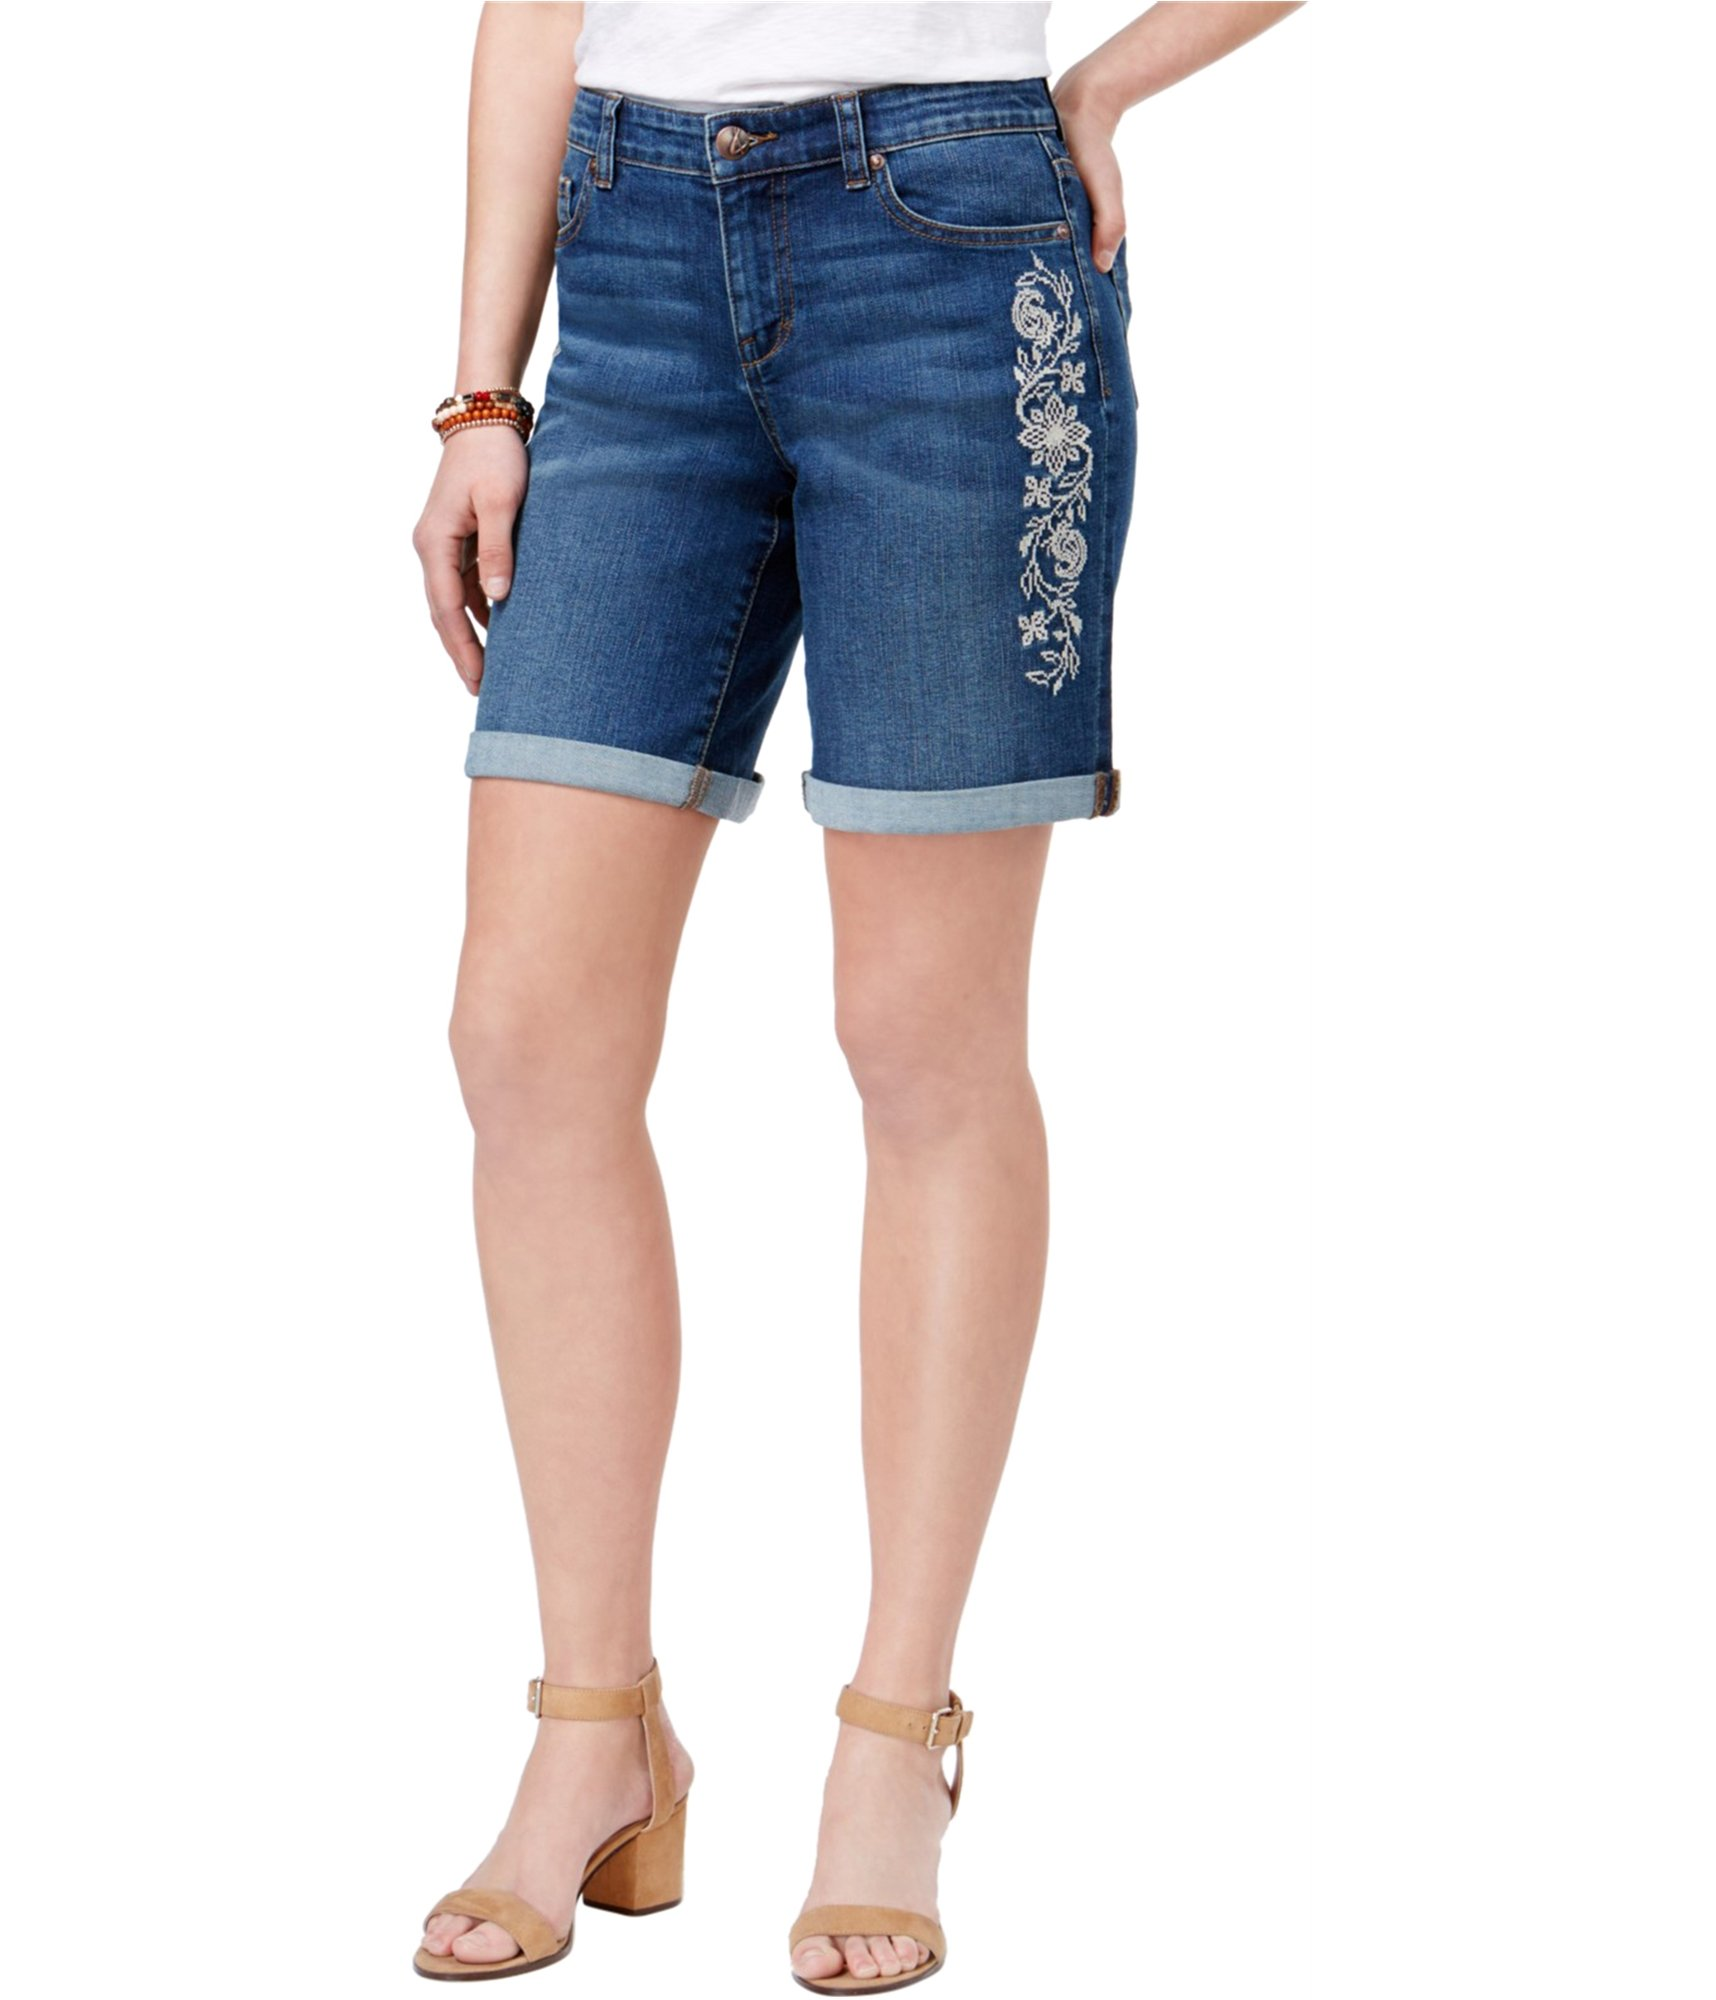 Style & Co. Womens Embroidered Dark Wash Denim Shorts Blue 12